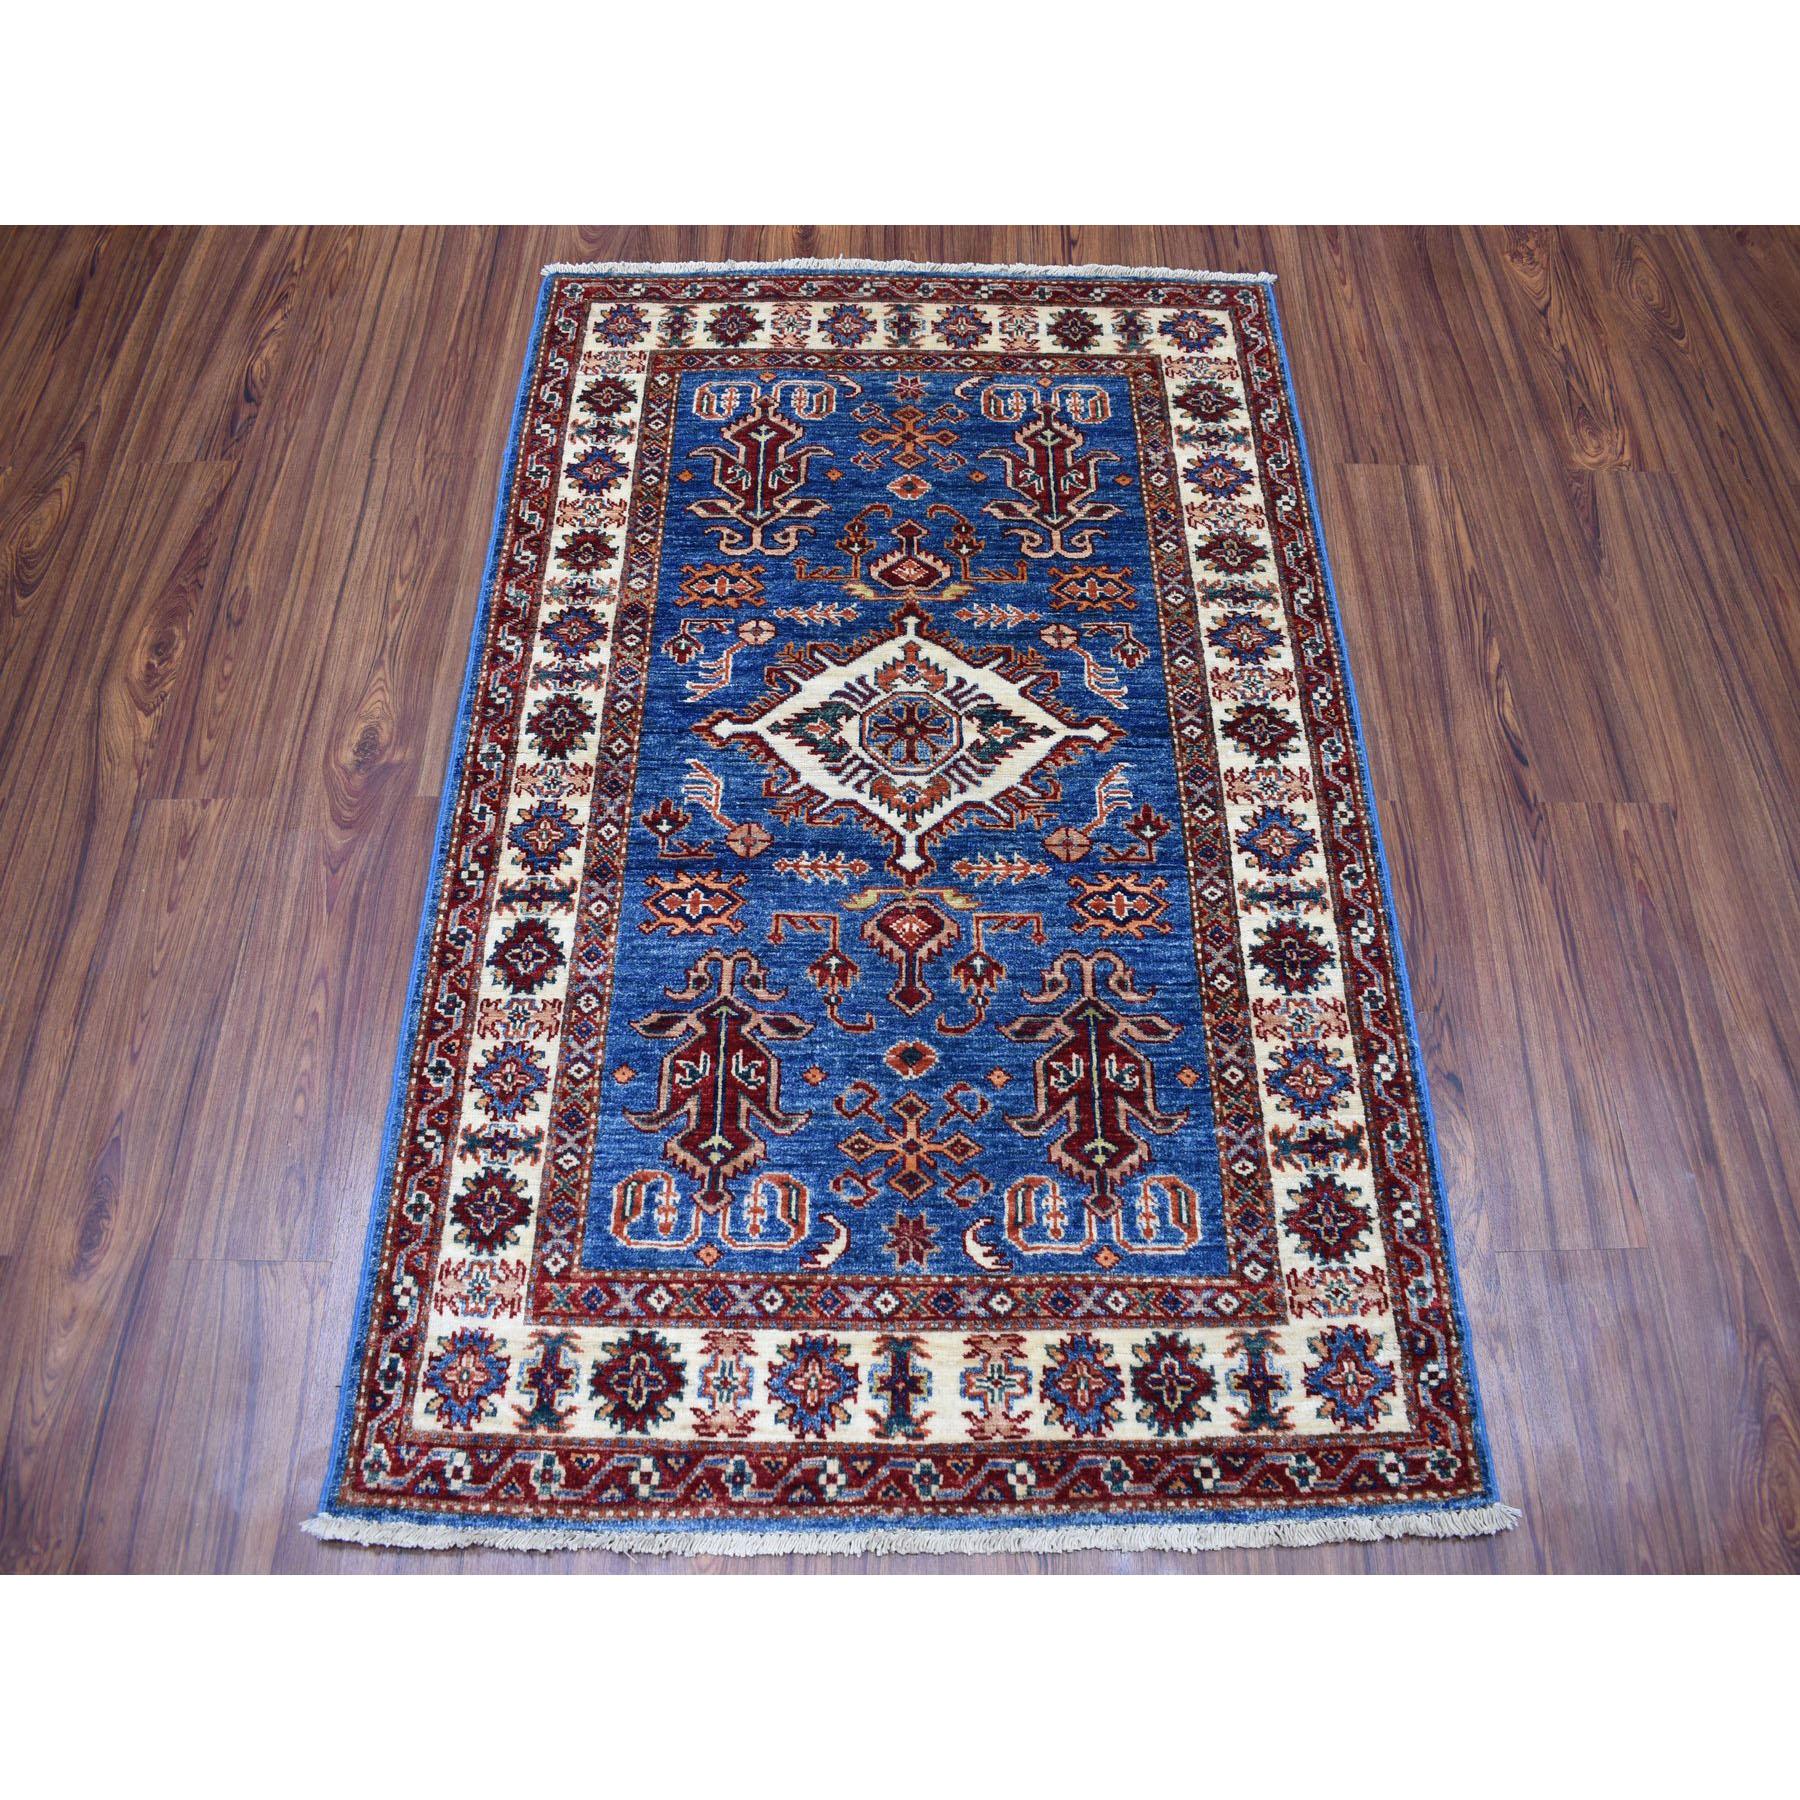 "3'3""x4'8"" Blue Super Kazak Geometric Design Pure Wool Hand-Knotted Oriental Rug"